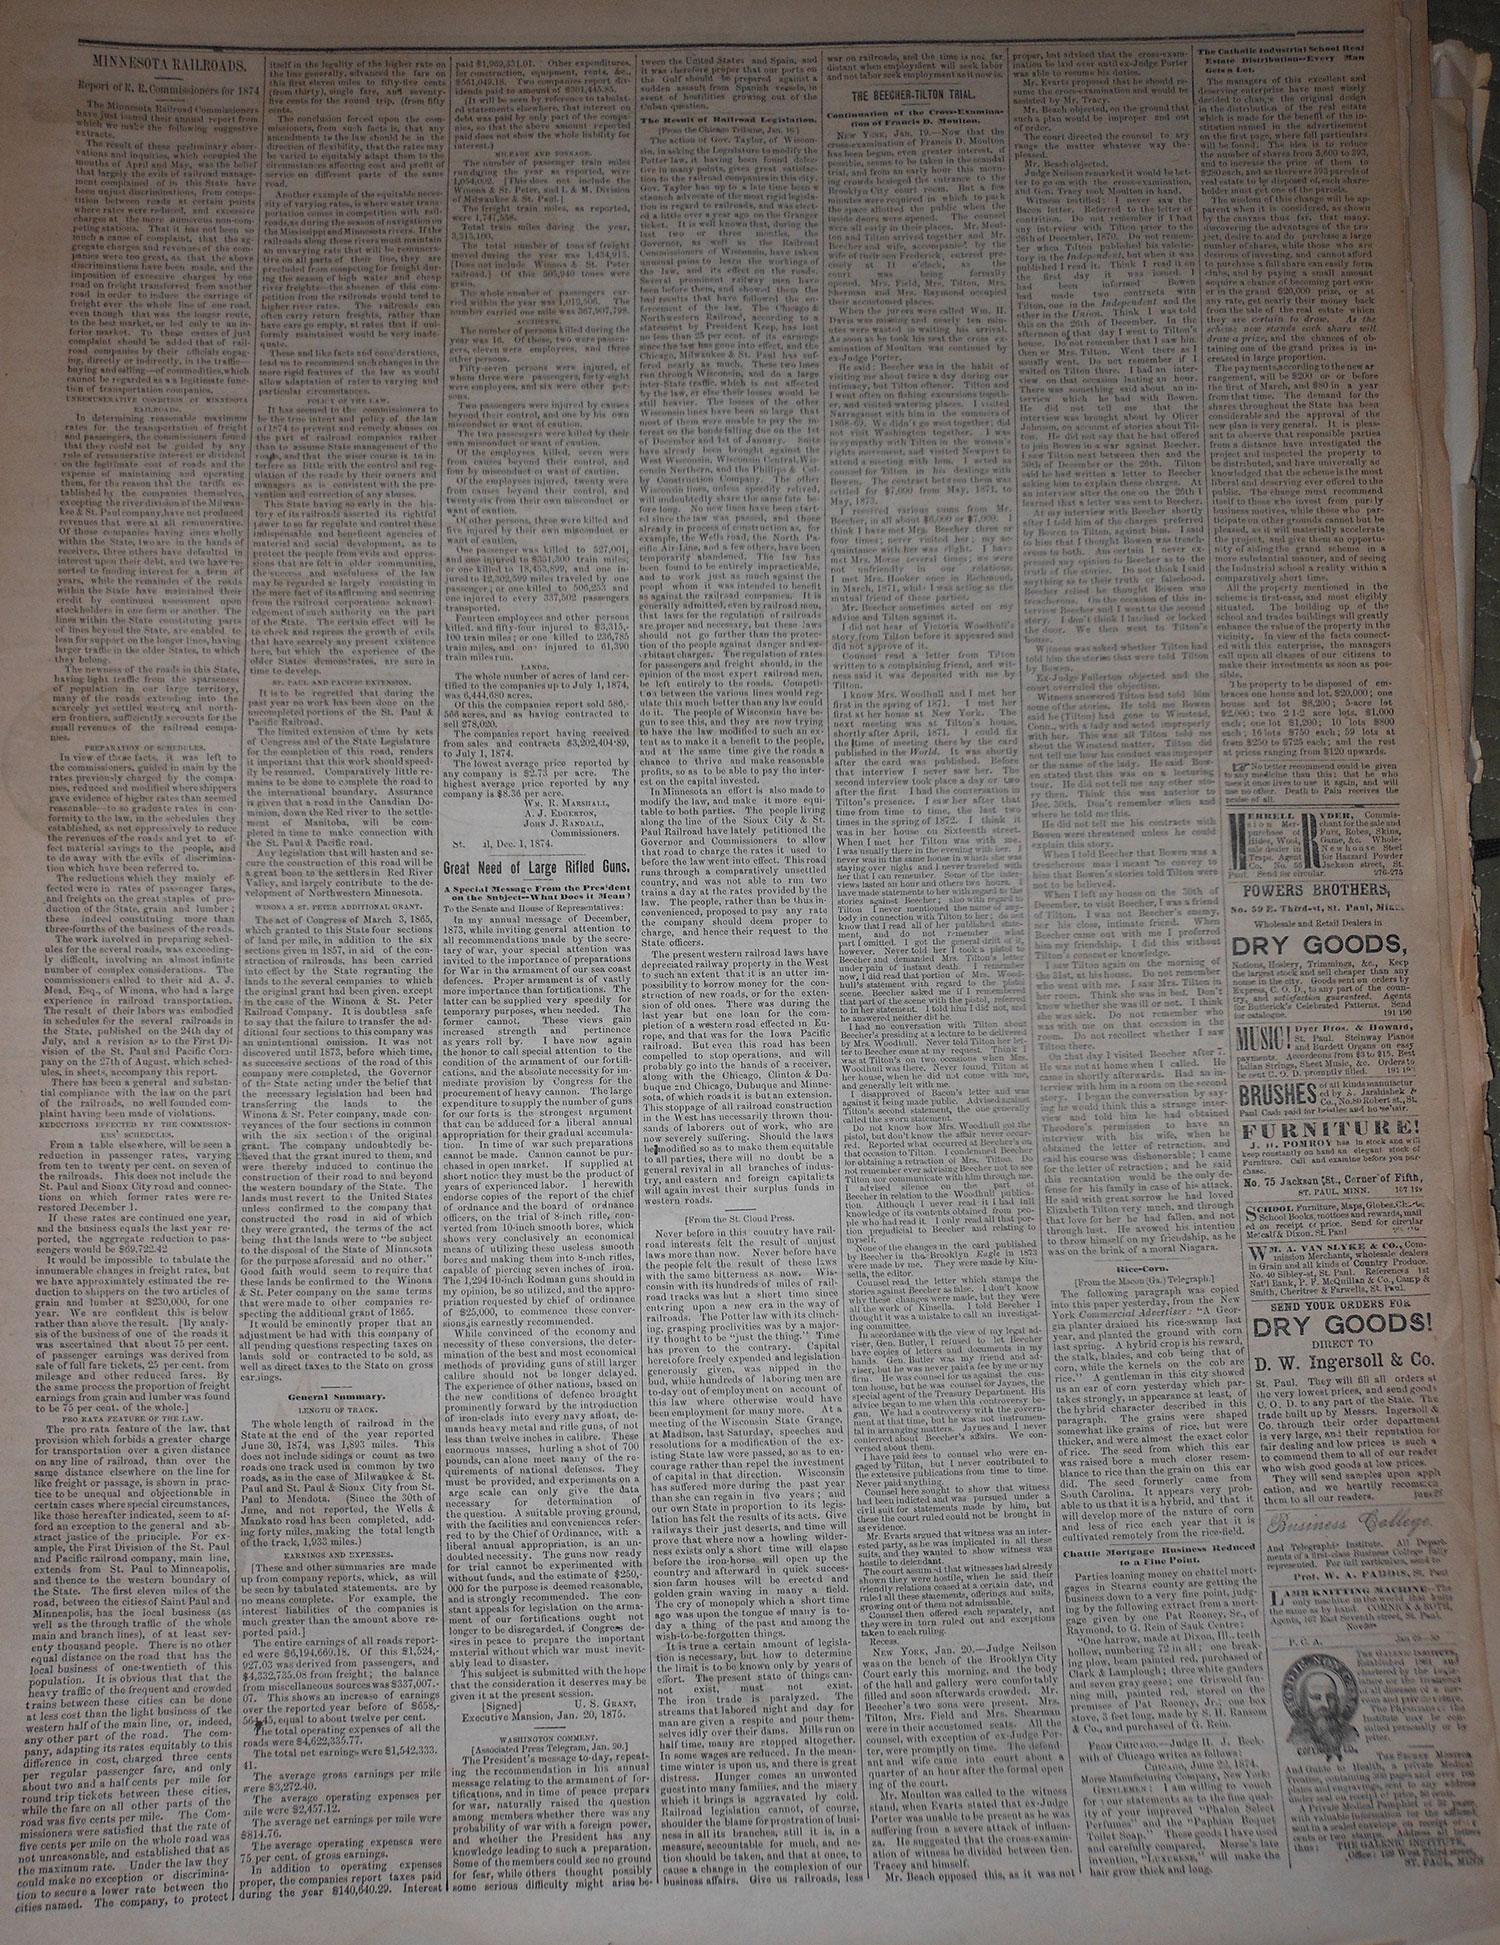 1/27/1875, p3